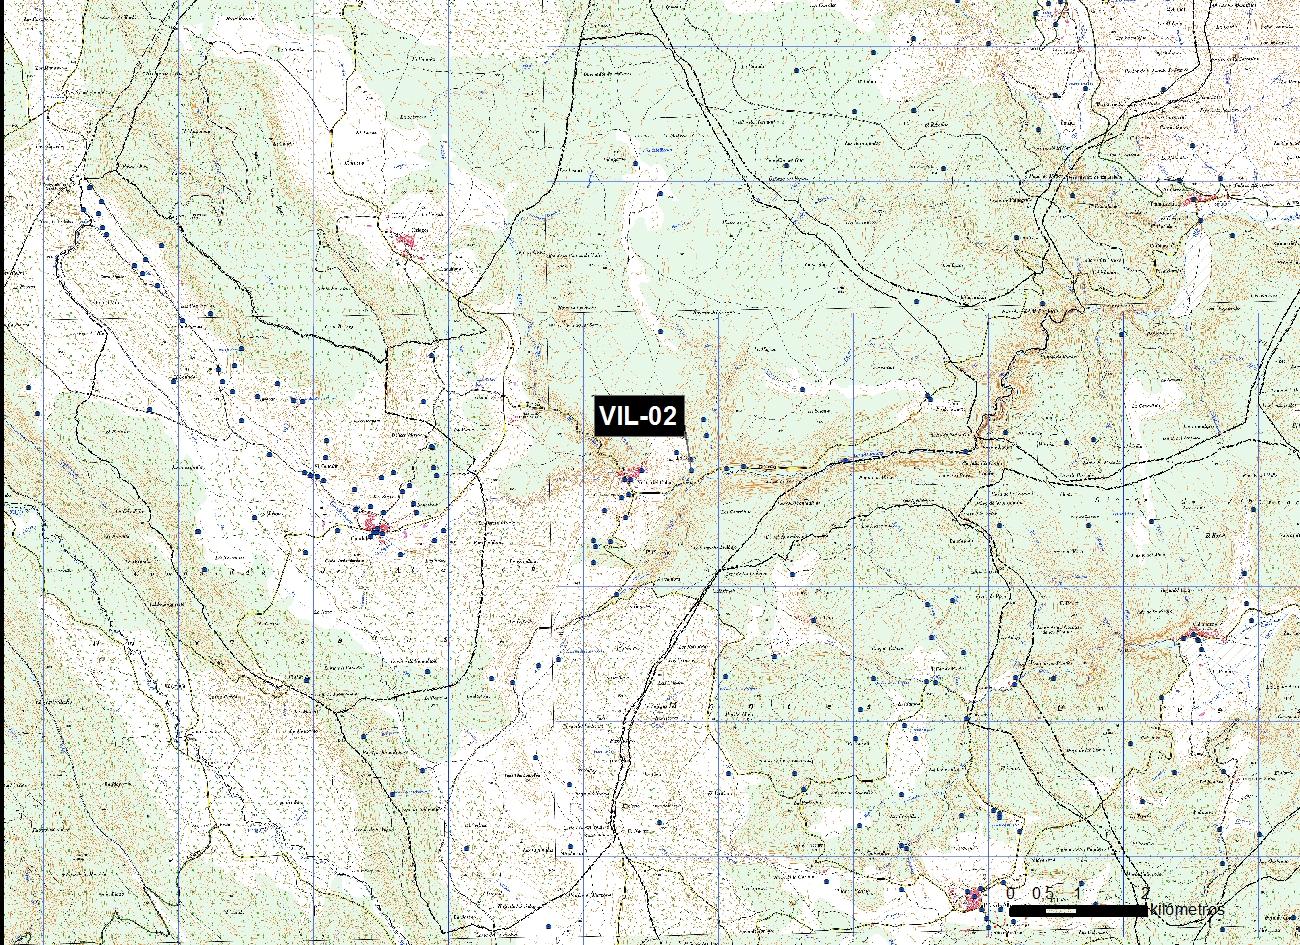 VIL_02_M.V.LOZANO_CARRERAS_MAP.TOPO 1